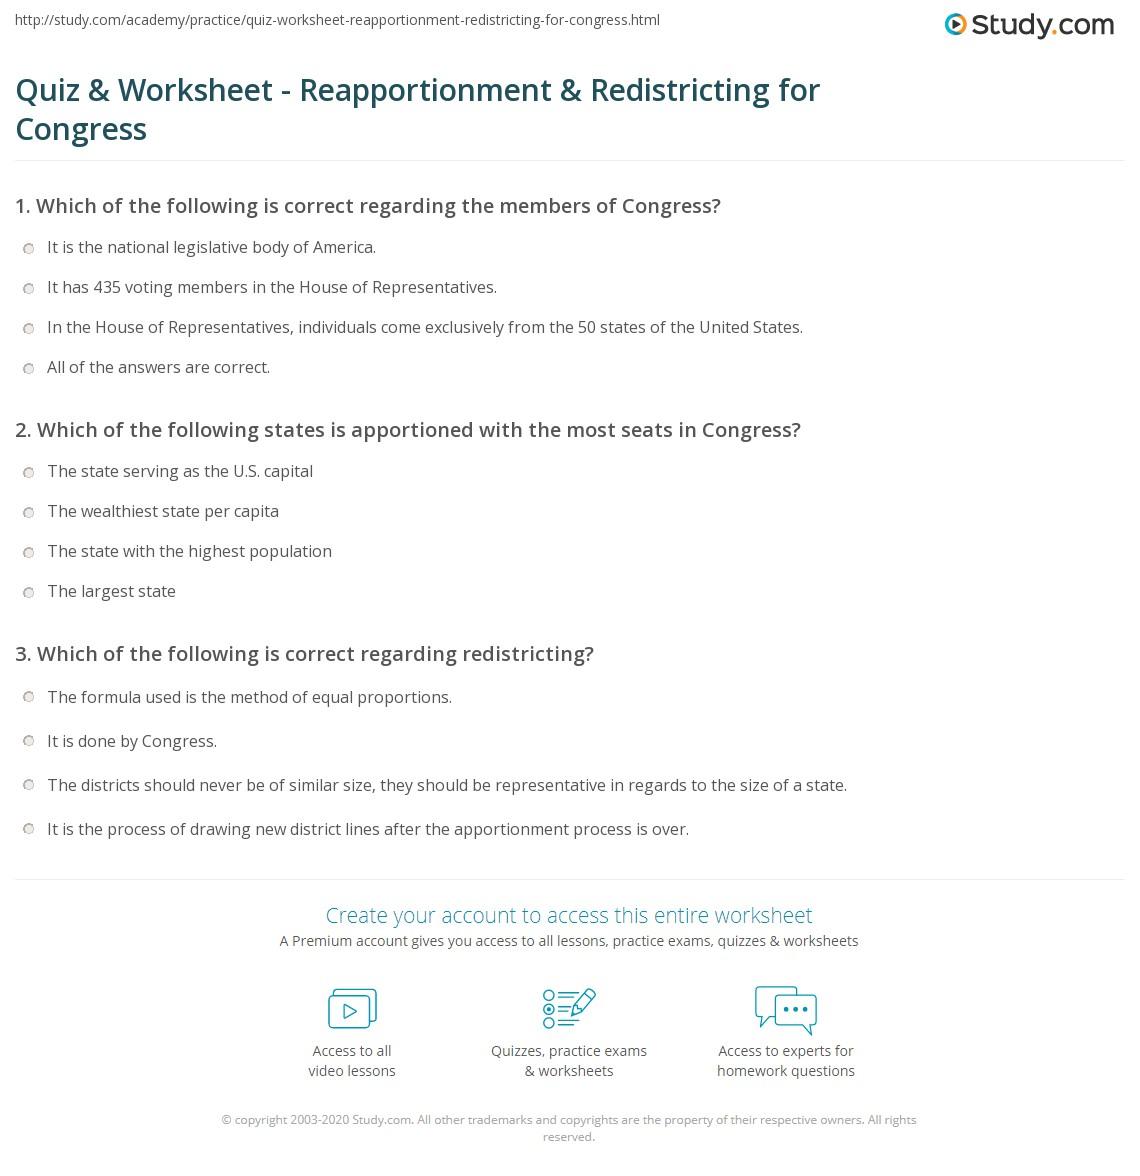 Quiz Worksheet Reapportionment Redistricting for Congress – Gerrymandering Worksheet